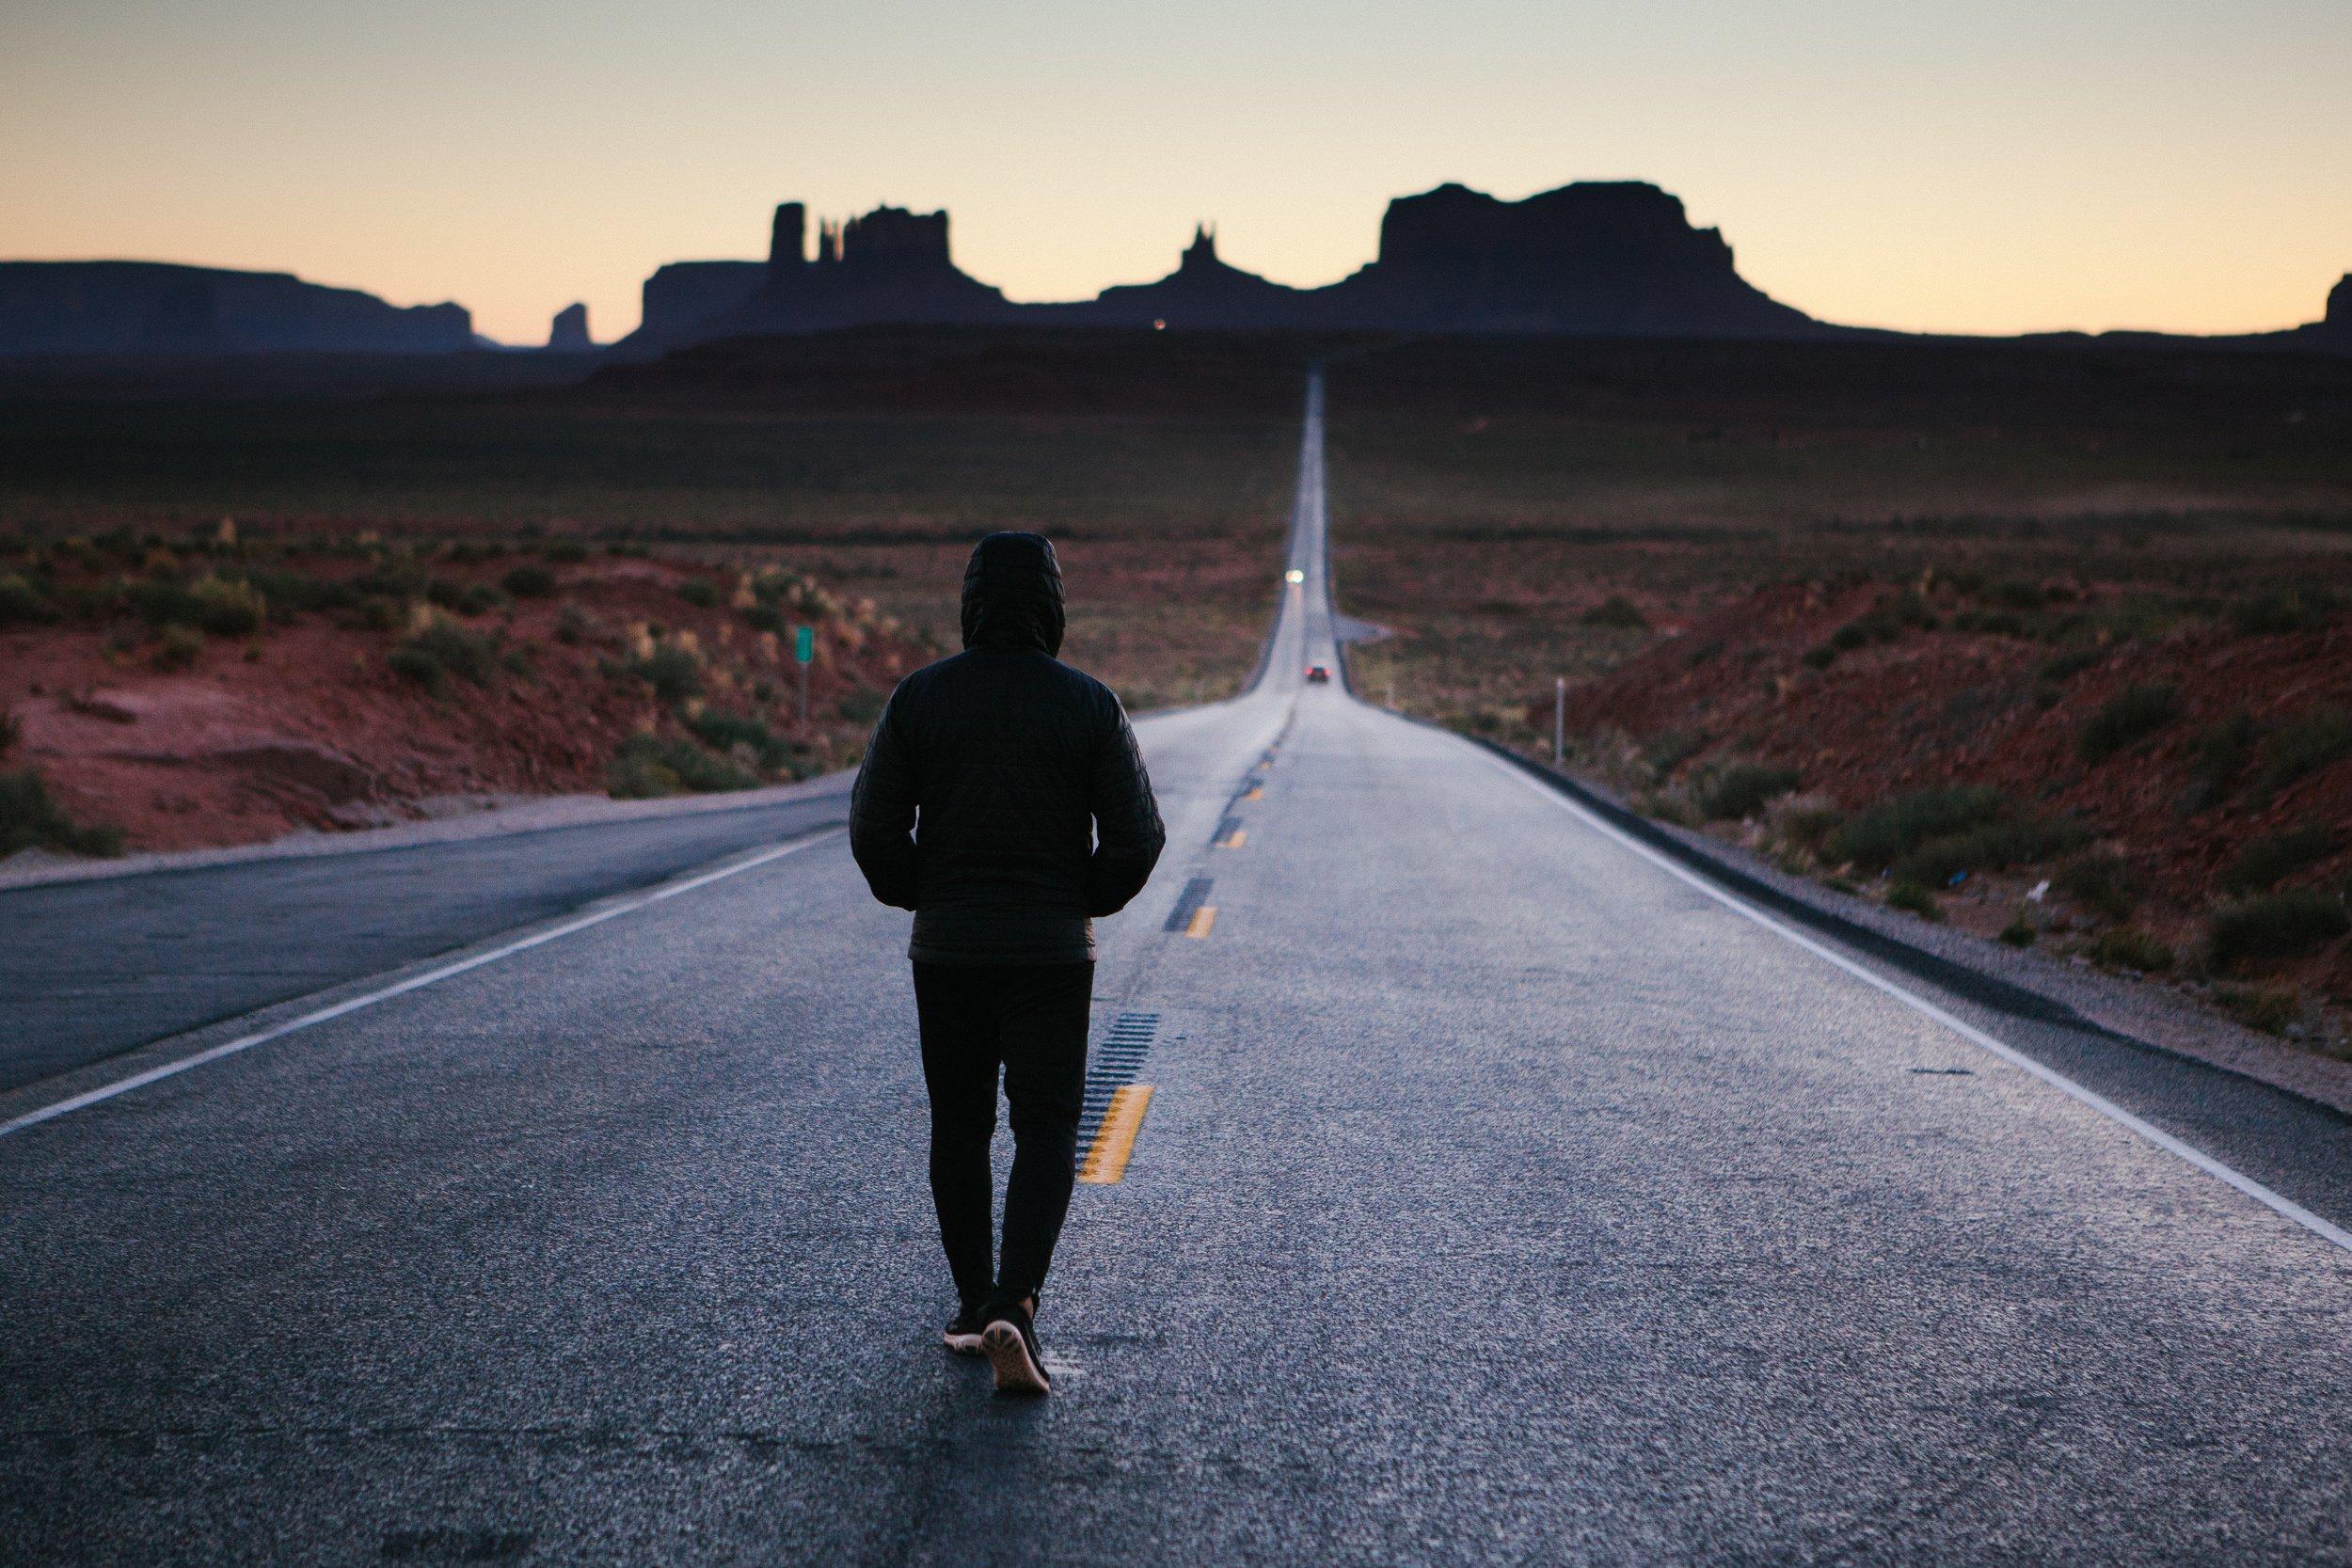 man-walking-road-finding-his-way-mental-health